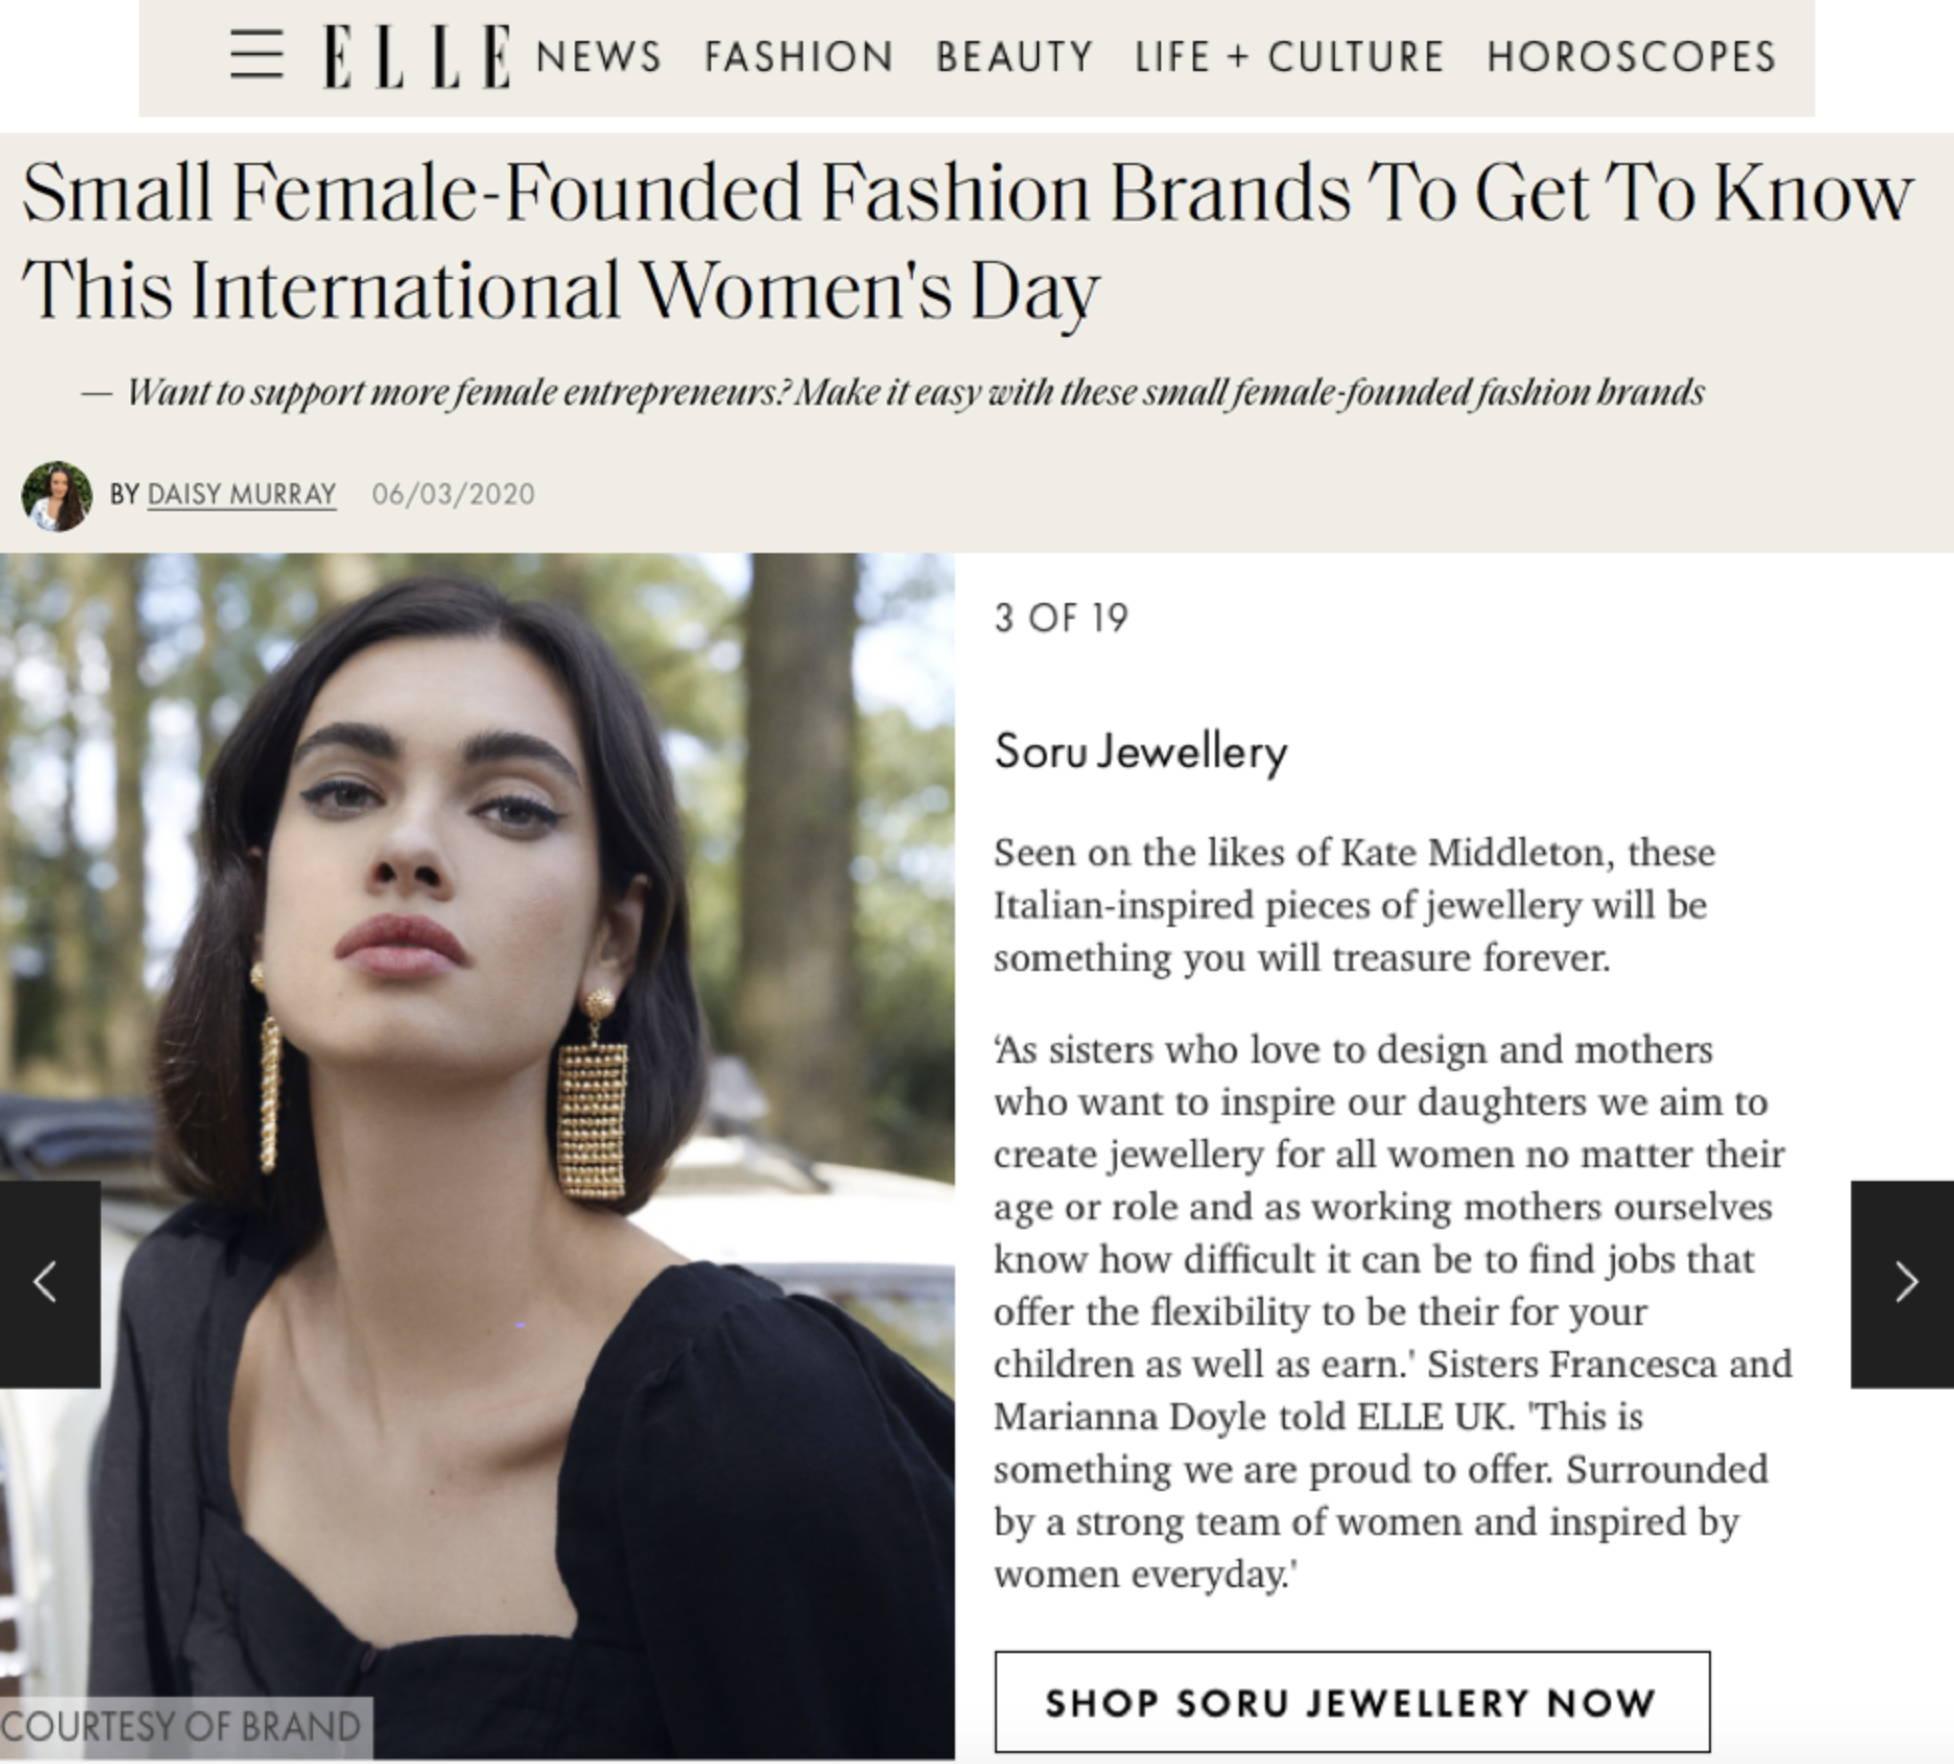 SORU JEWELLERY WOMENS INTERNATIONAL DAY BRAND